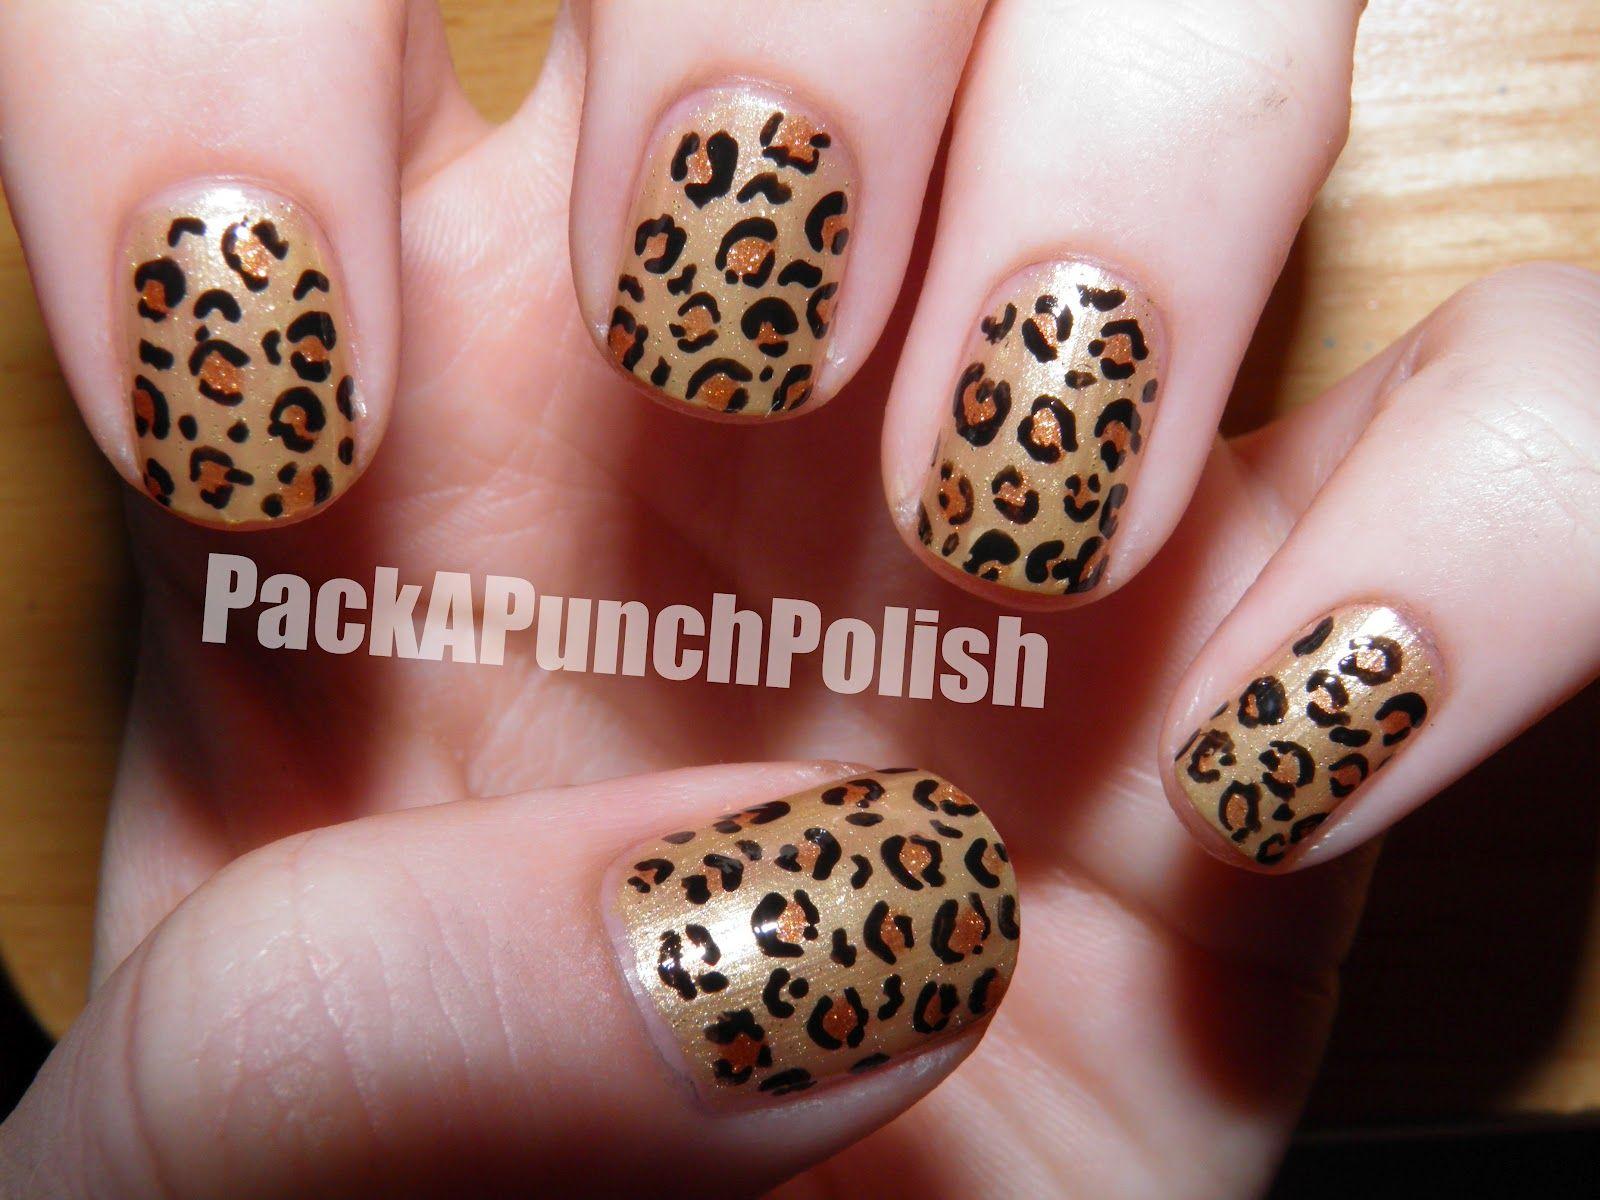 Packapunchpolish Leopard Print Nail Art Video How To Fingernails